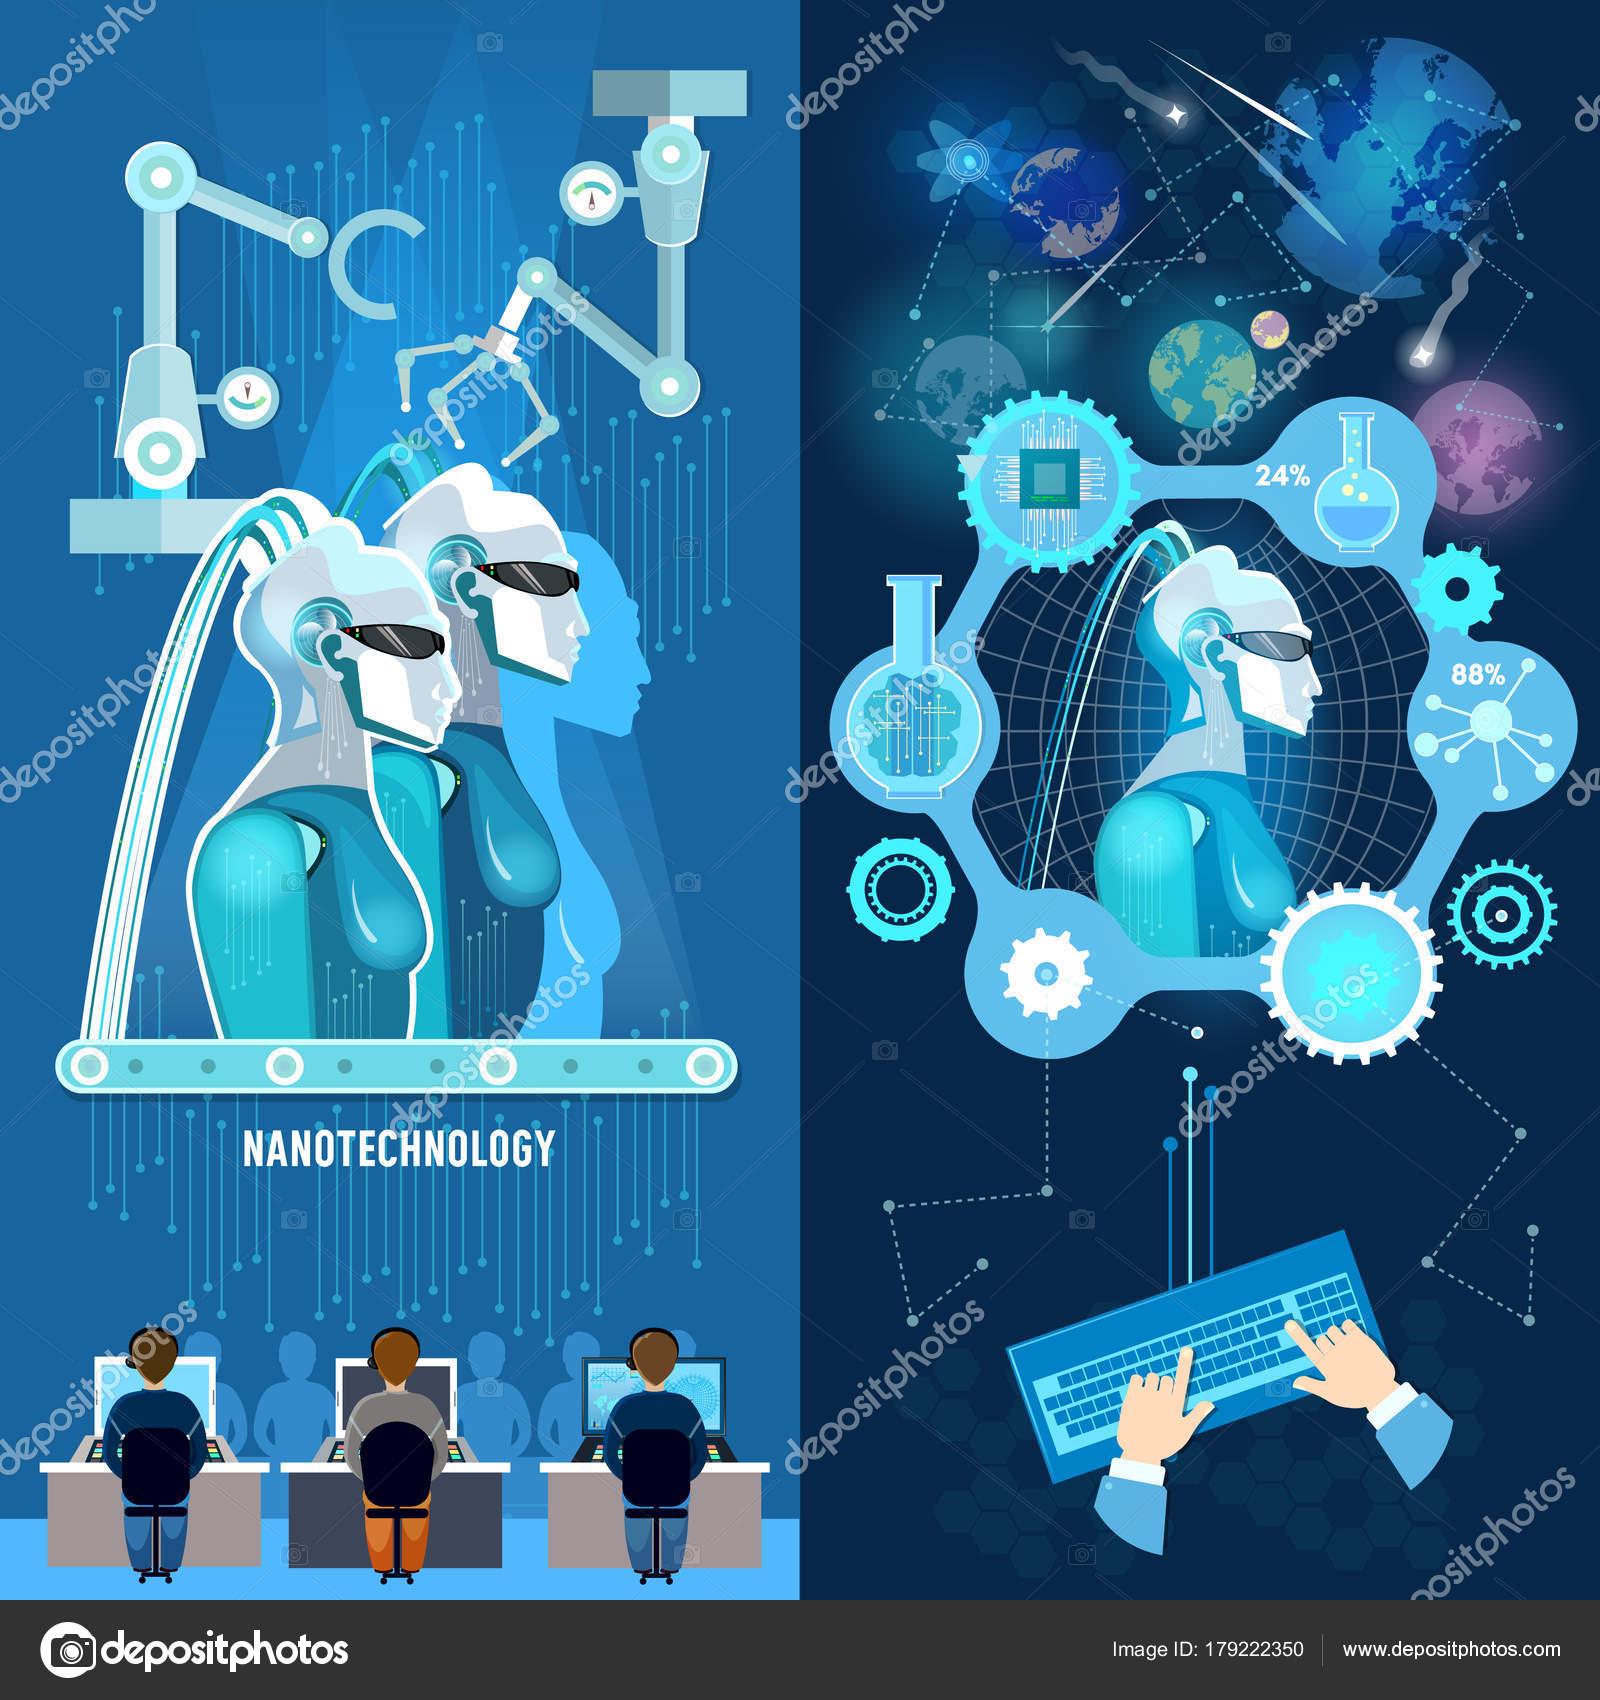 https://st3.depositphotos.com/5988232/17922/v/1600/depositphotos_179222350-stock-illustration-future-technology-banner-nanotechnologies-programming.jpg